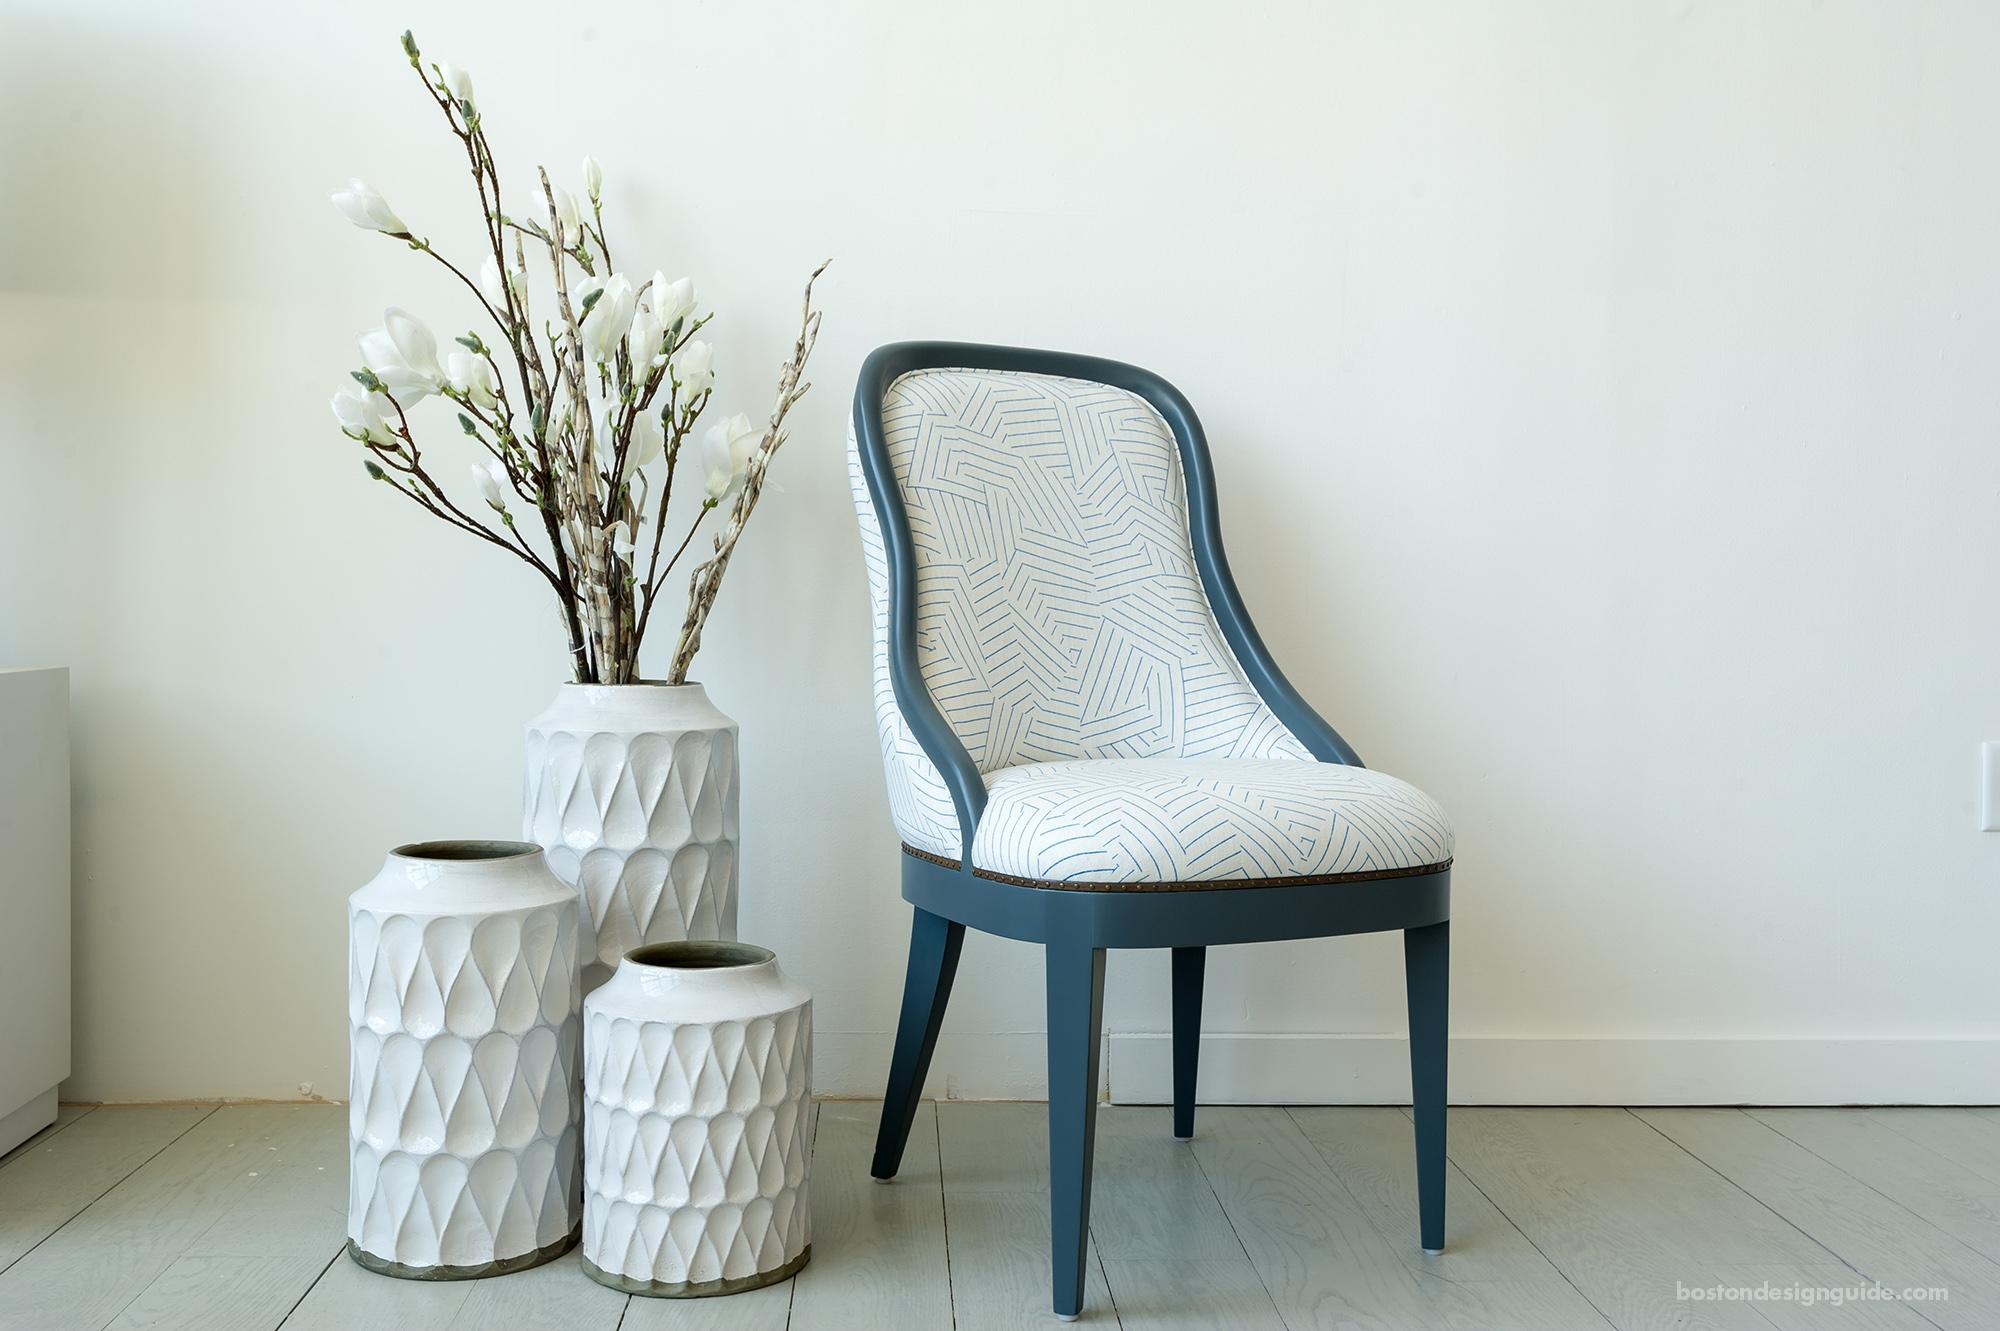 Dowel Furniture Boston Design Guide